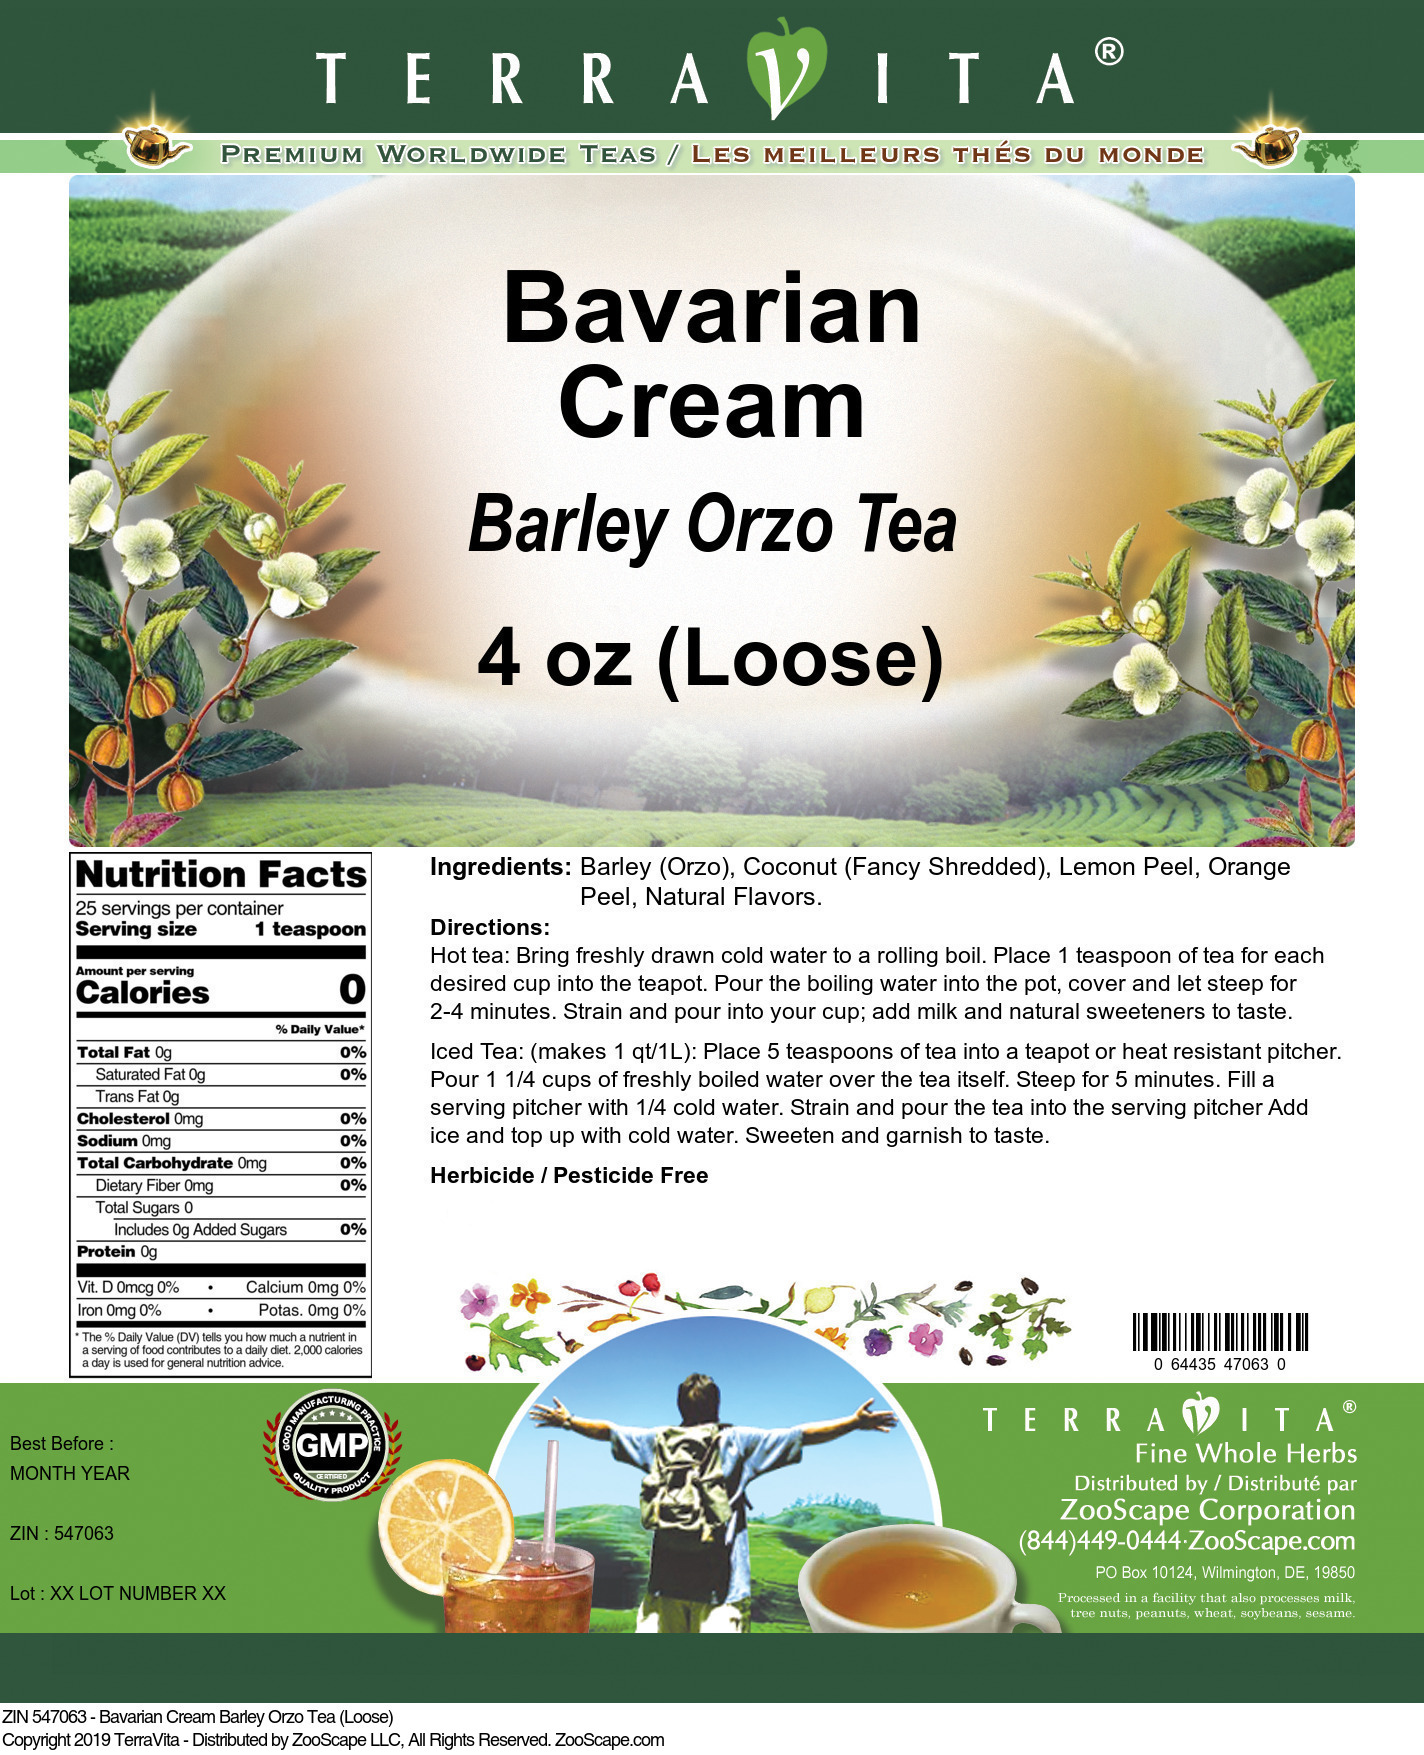 Bavarian Cream Barley Orzo